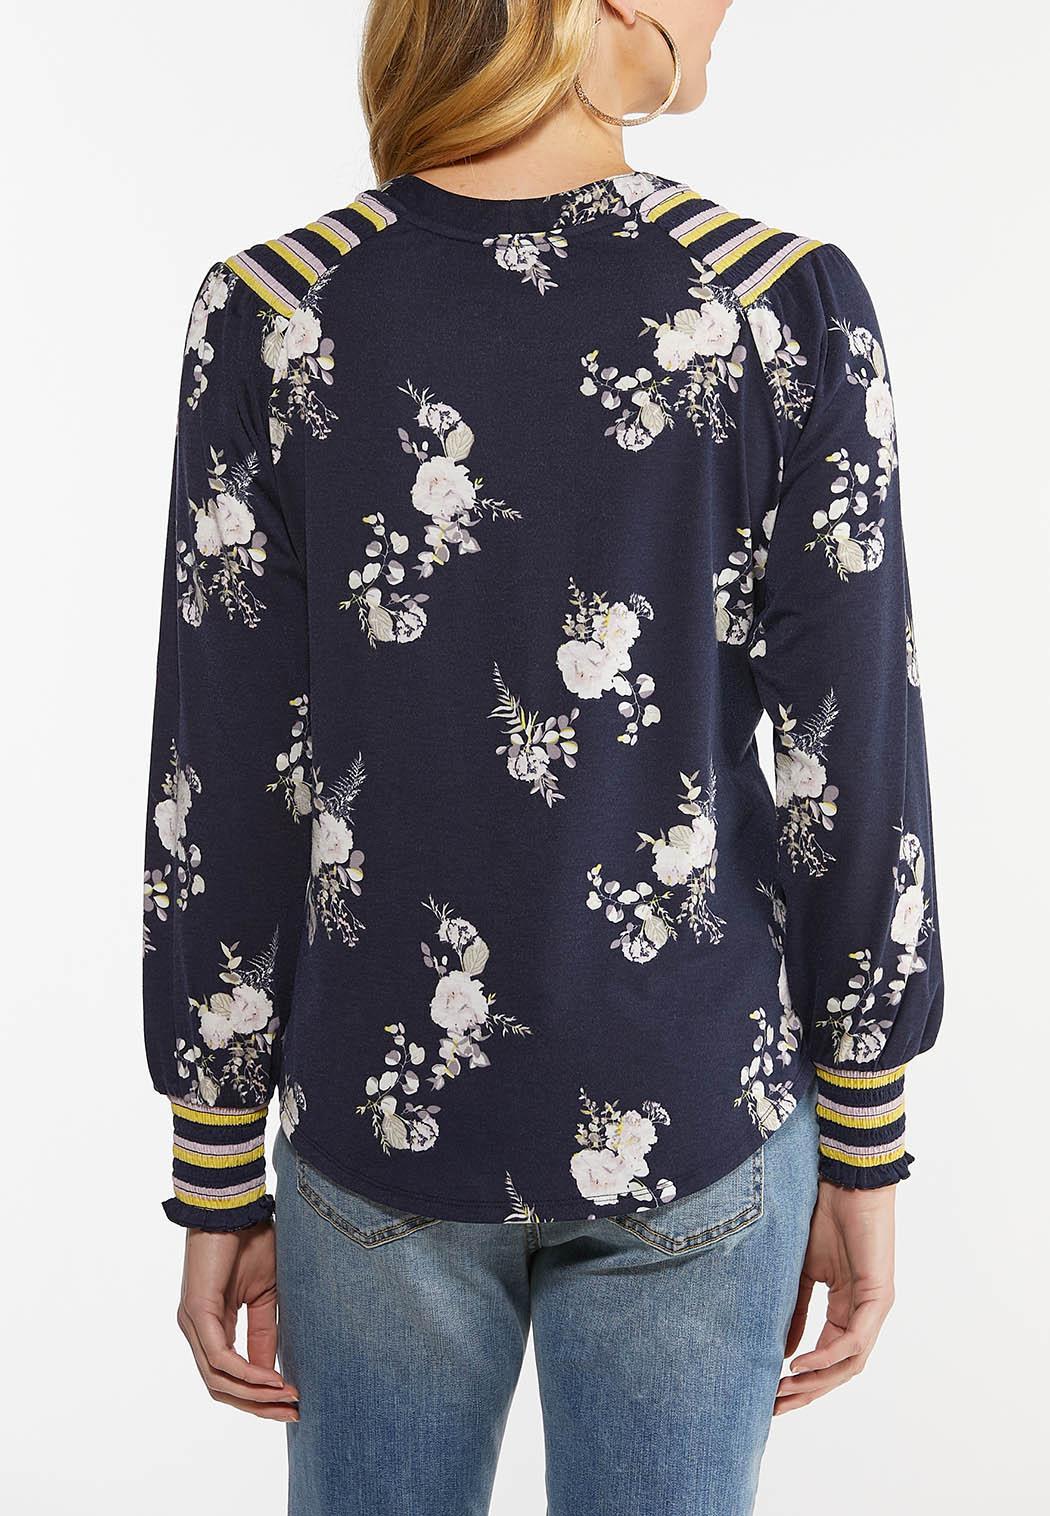 Plus Size Tasseled Floral Top (Item #44482383)